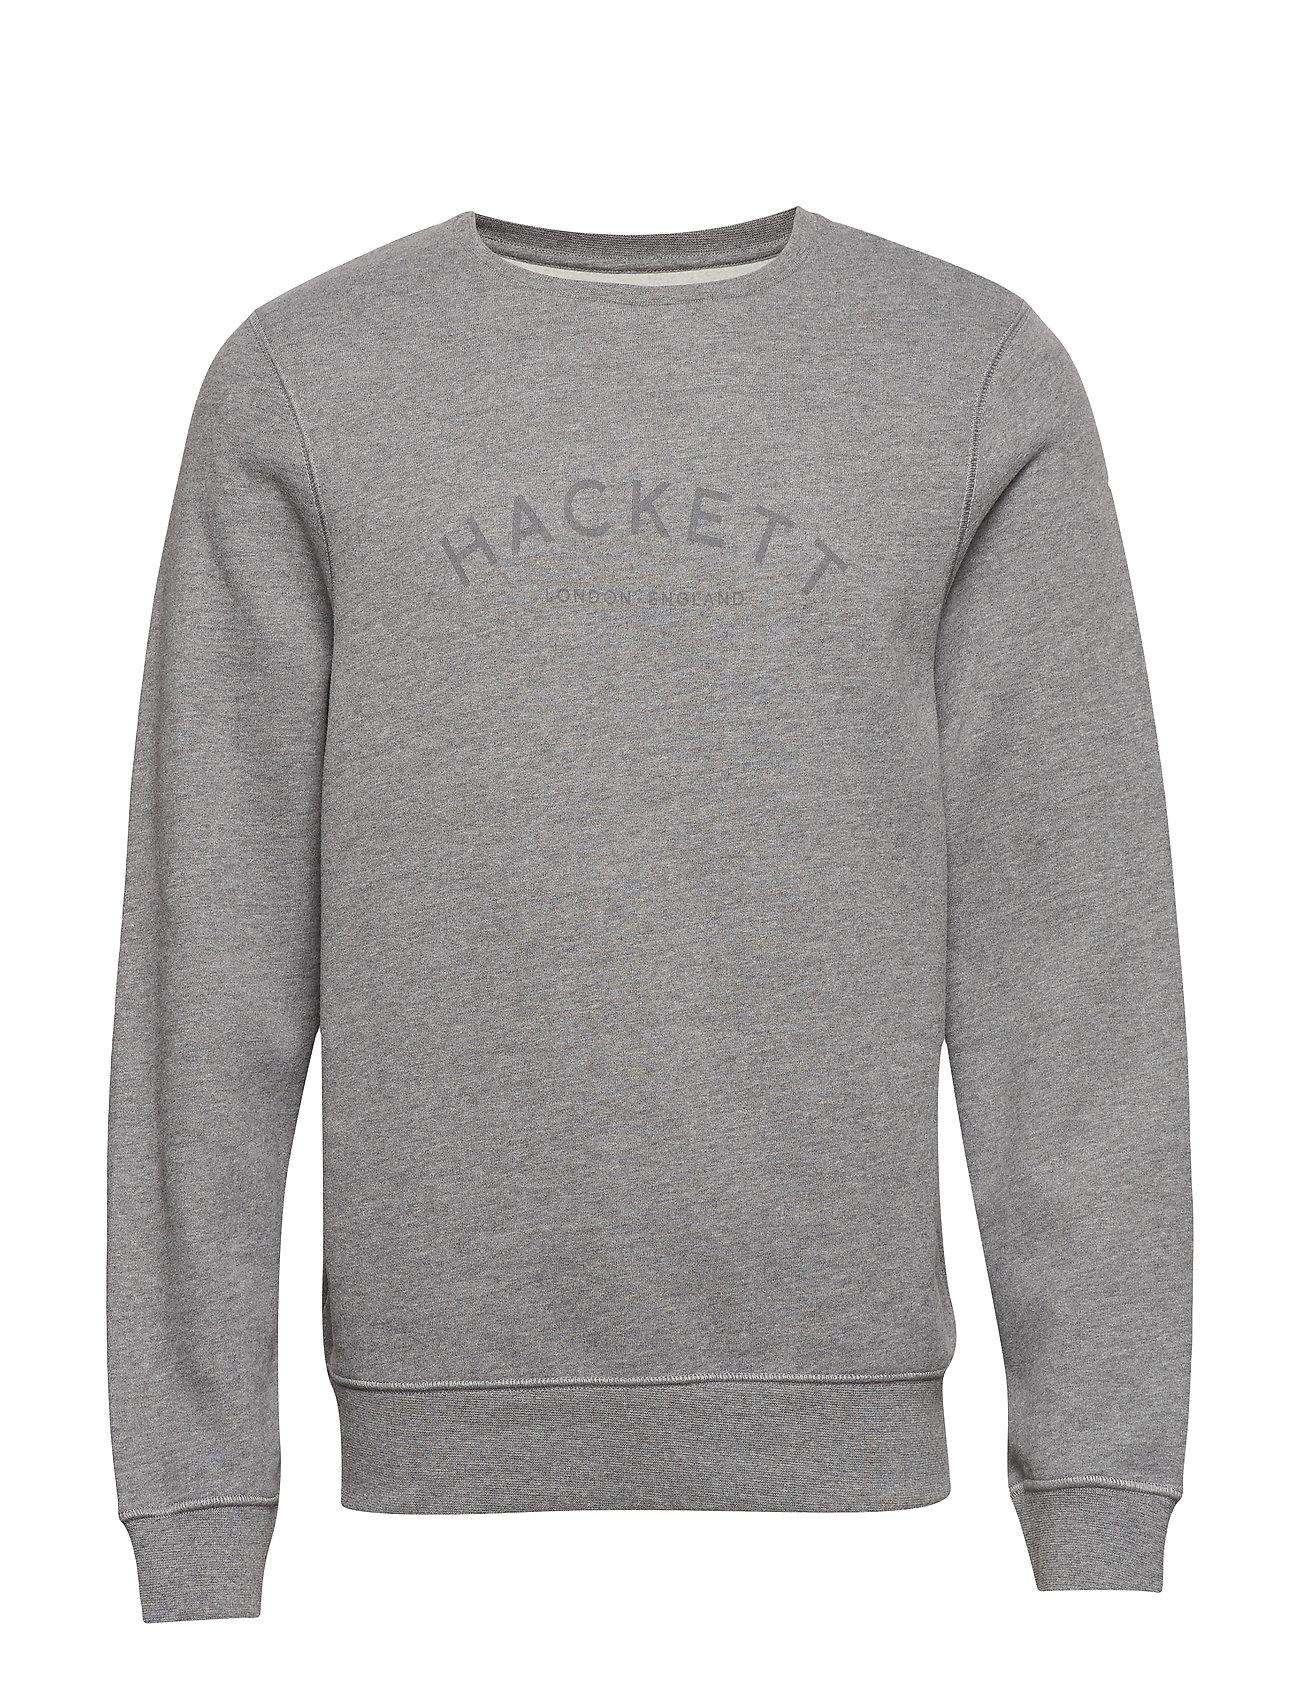 Hackett CLASC LOGO CREW - 933GREY MARL